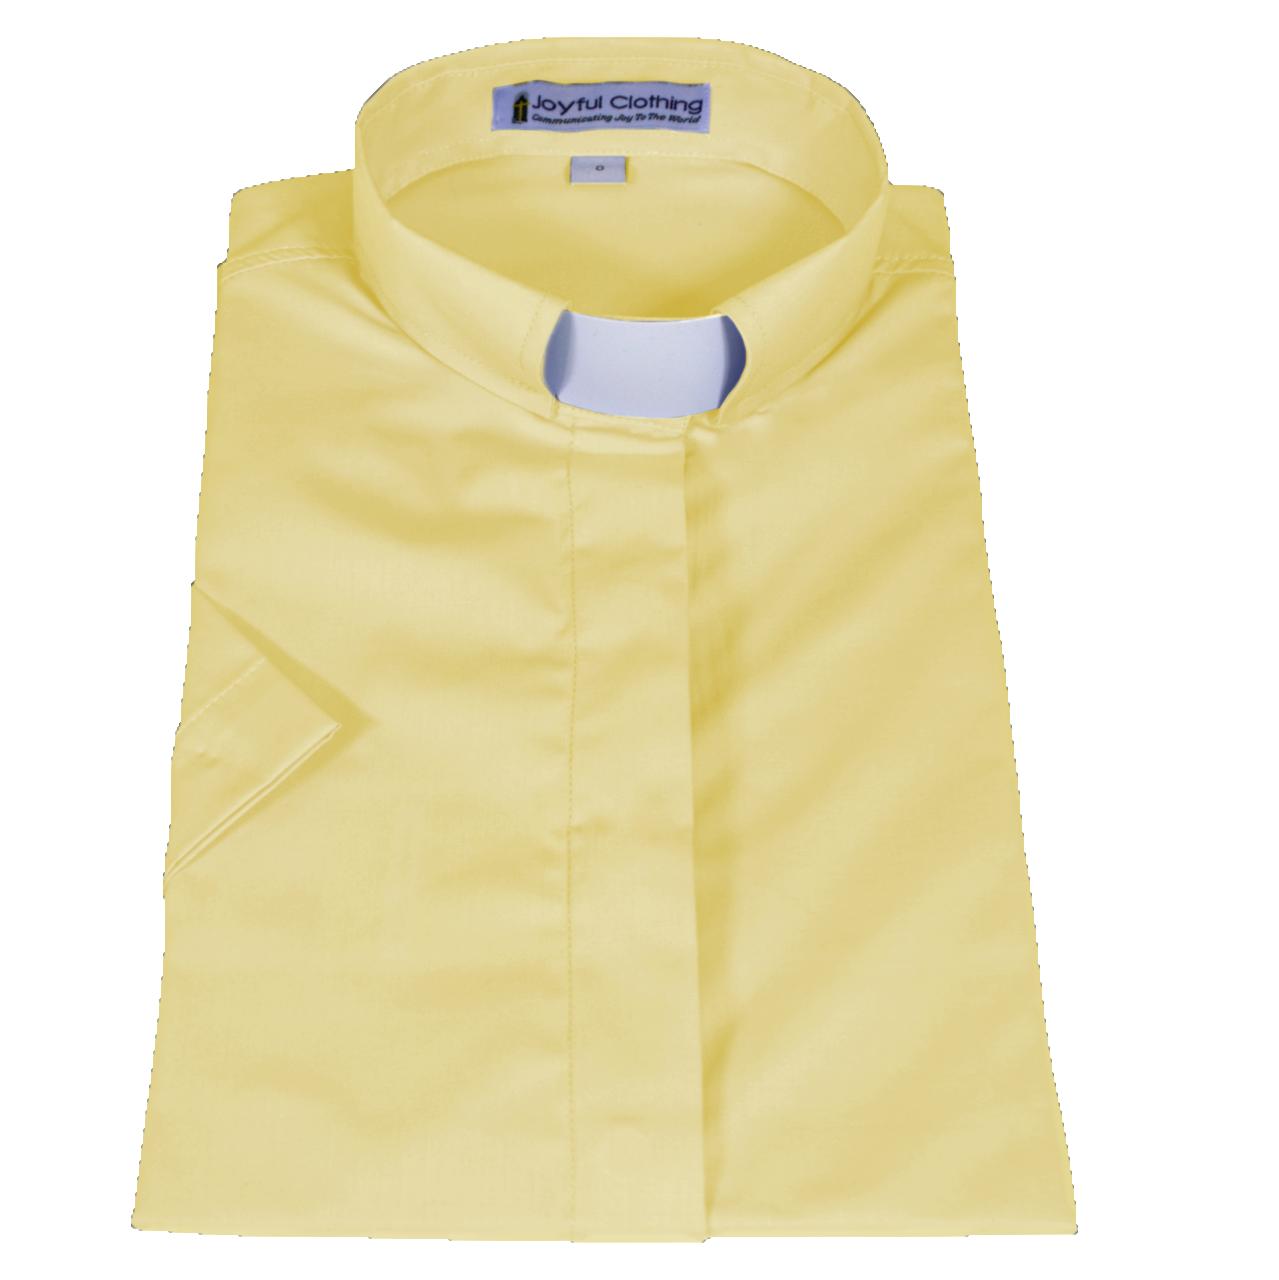 566. Women's Short-Sleeve Tab-Collar Clergy Shirt - Banana